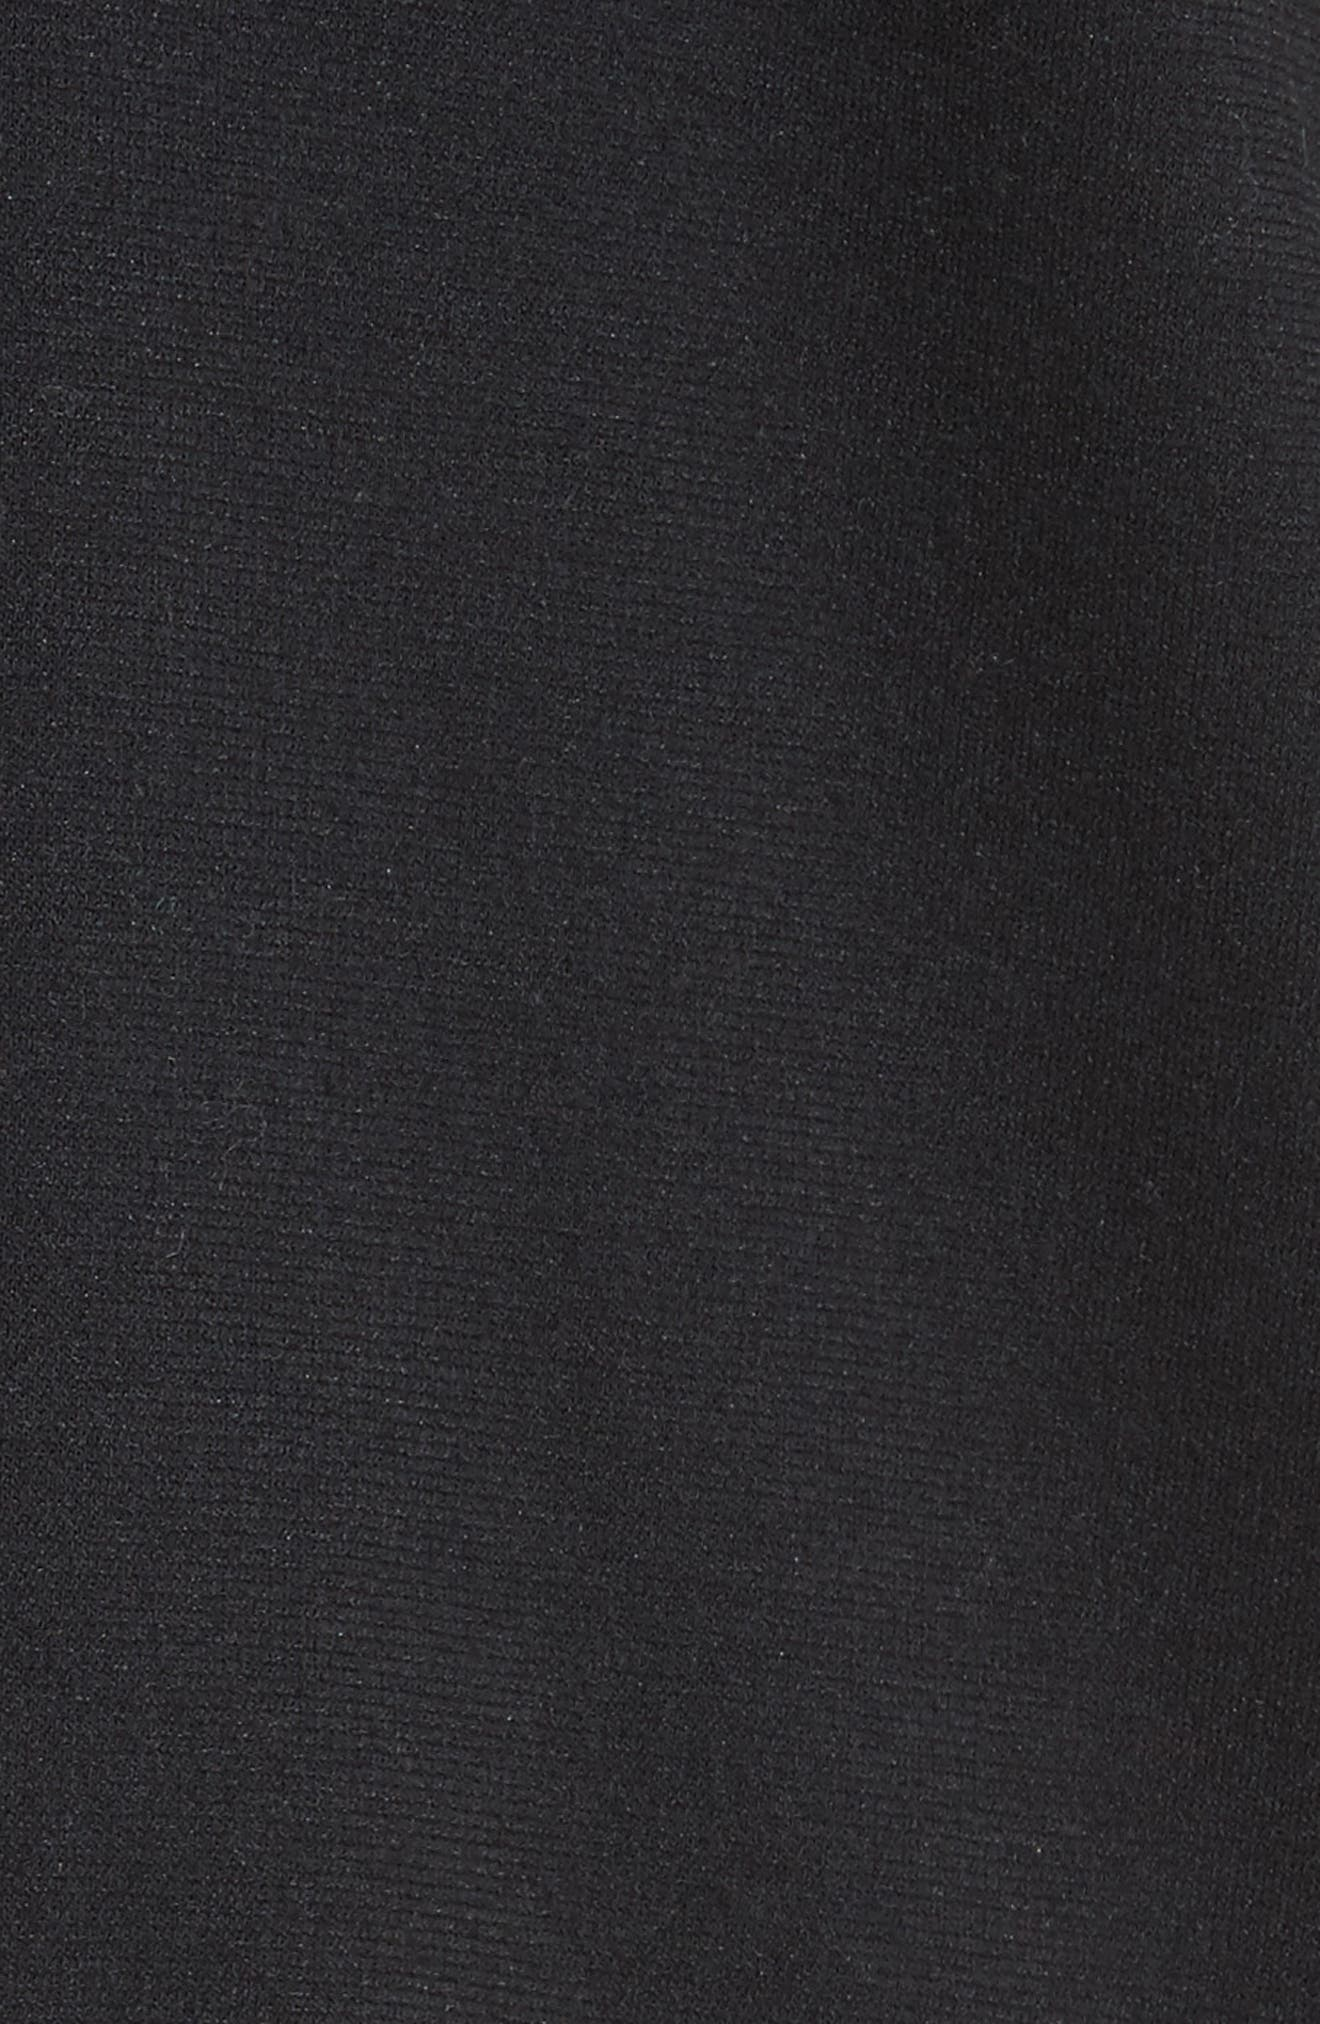 Deetra Rib Knit Trim Jacket,                             Alternate thumbnail 6, color,                             001